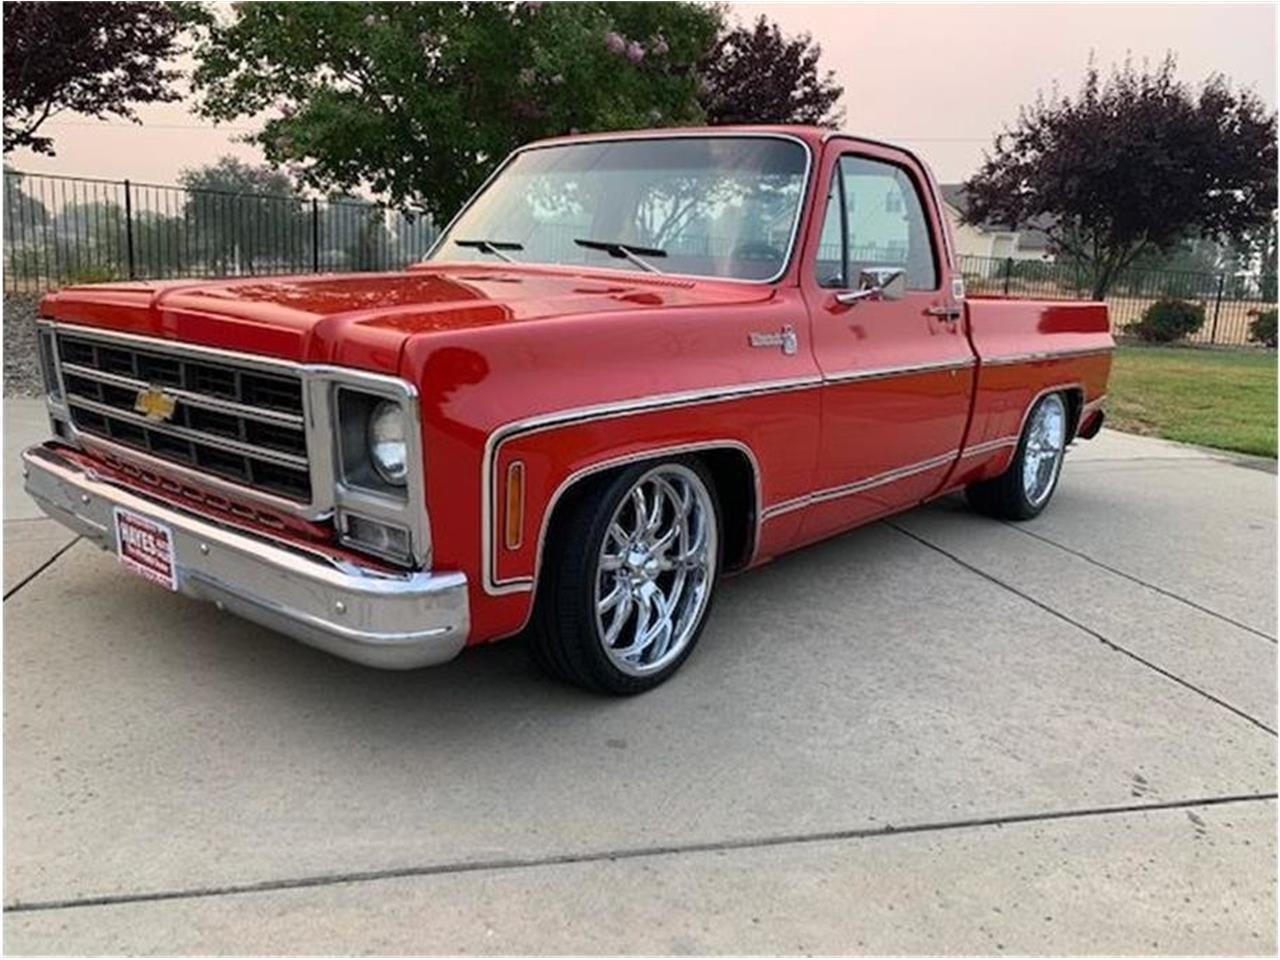 1979 Chevrolet Silverado (CC-1392192) for sale in Roseville, California